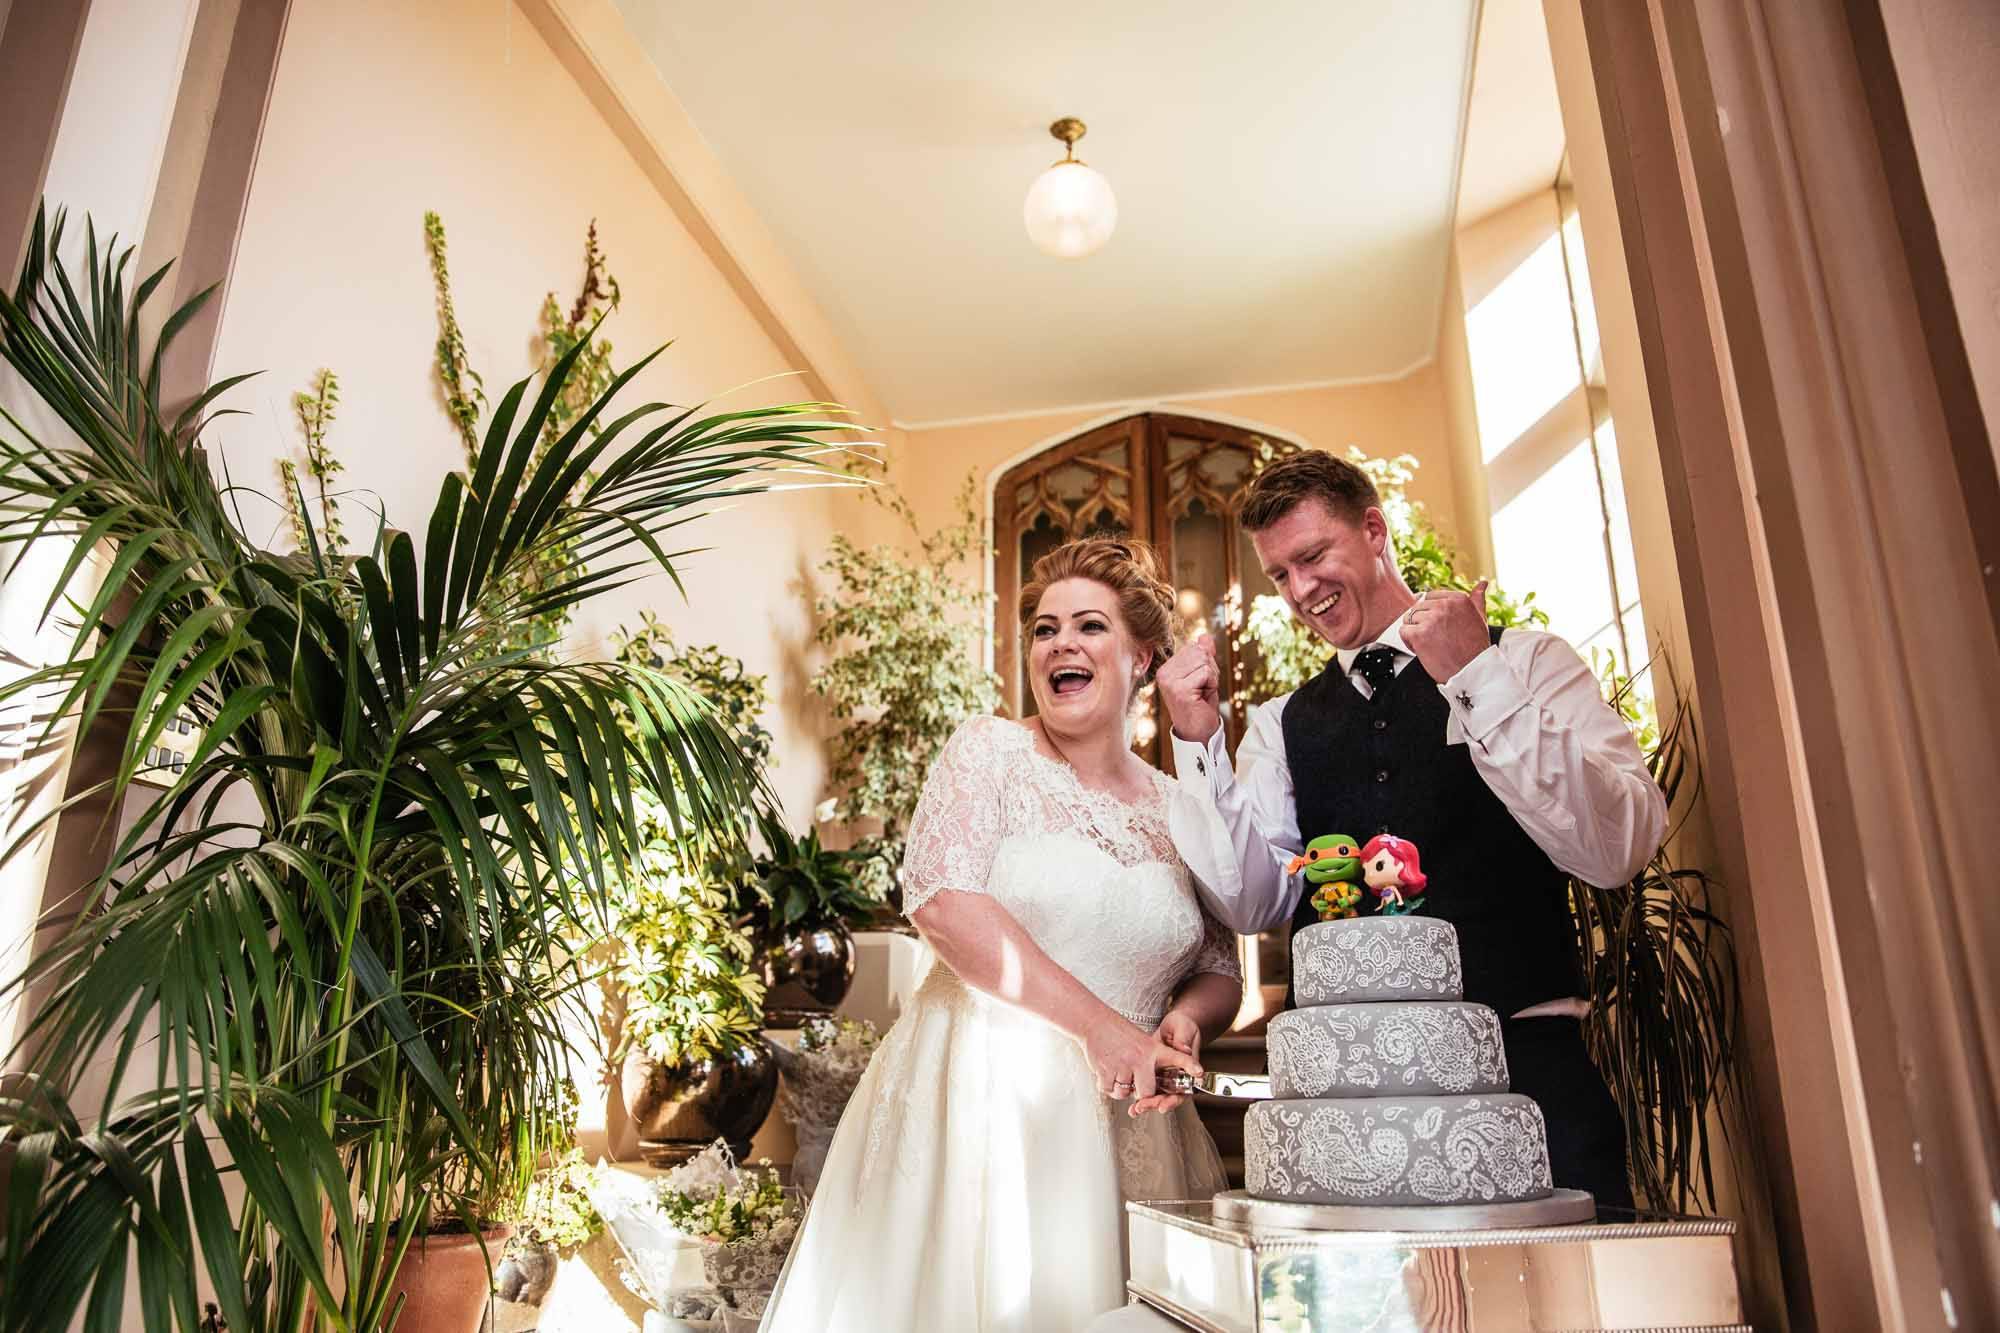 Wedding Reception Photos Cressbrook Hall